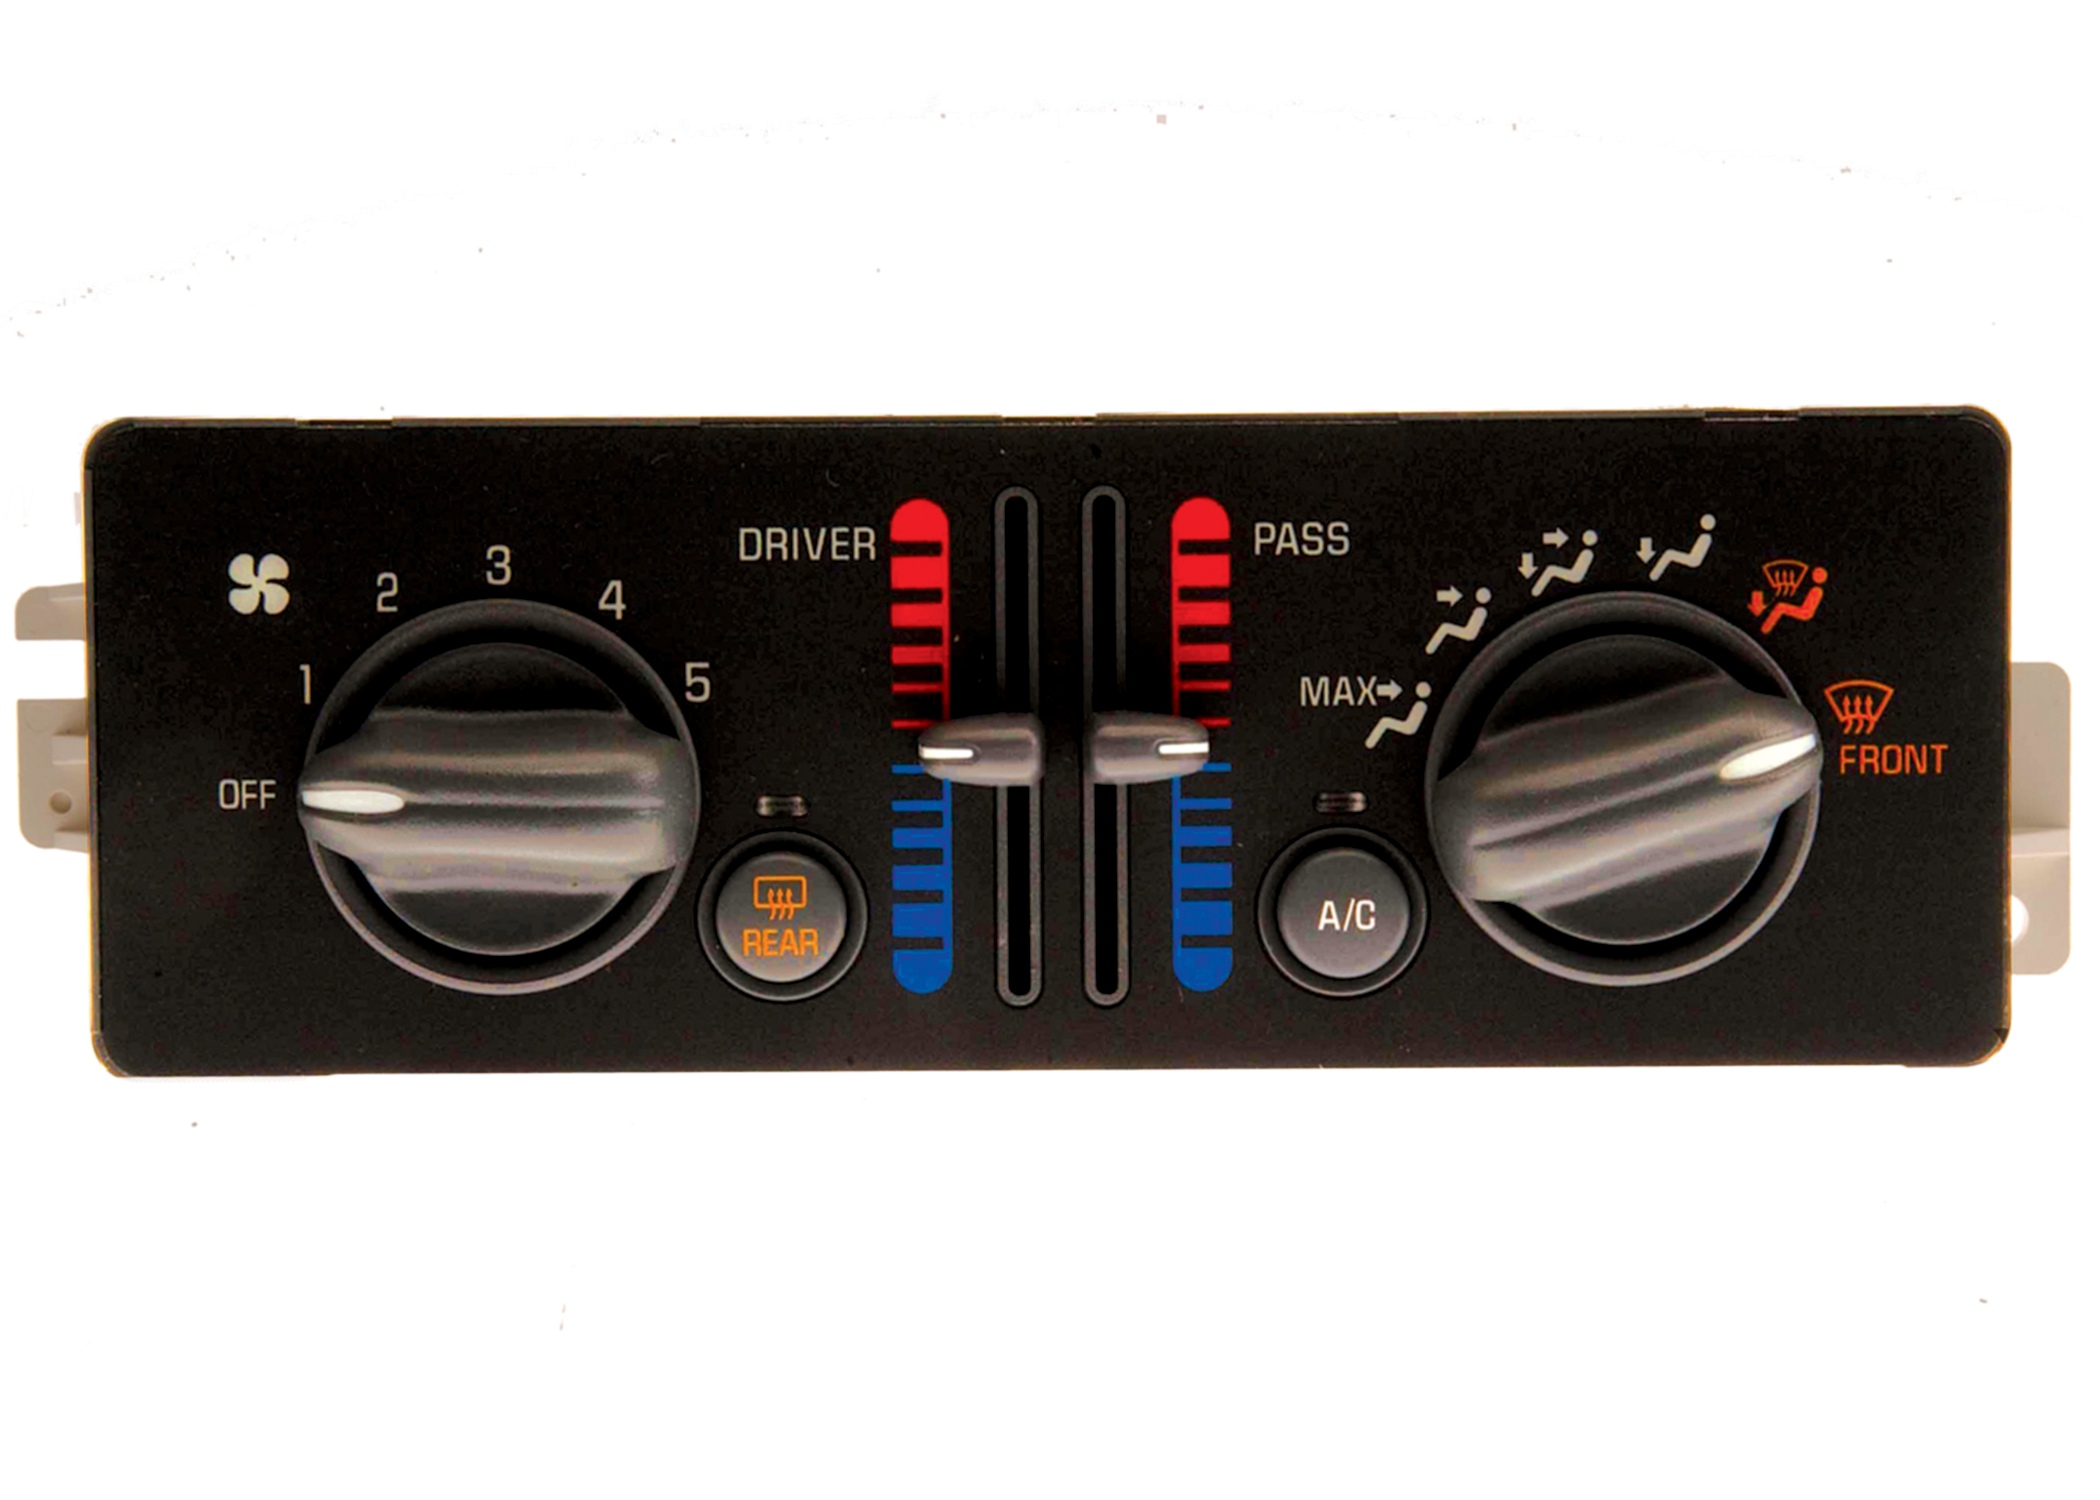 hvac control panel fits 01 03 pontiac grand prix 3 8l v6. Black Bedroom Furniture Sets. Home Design Ideas